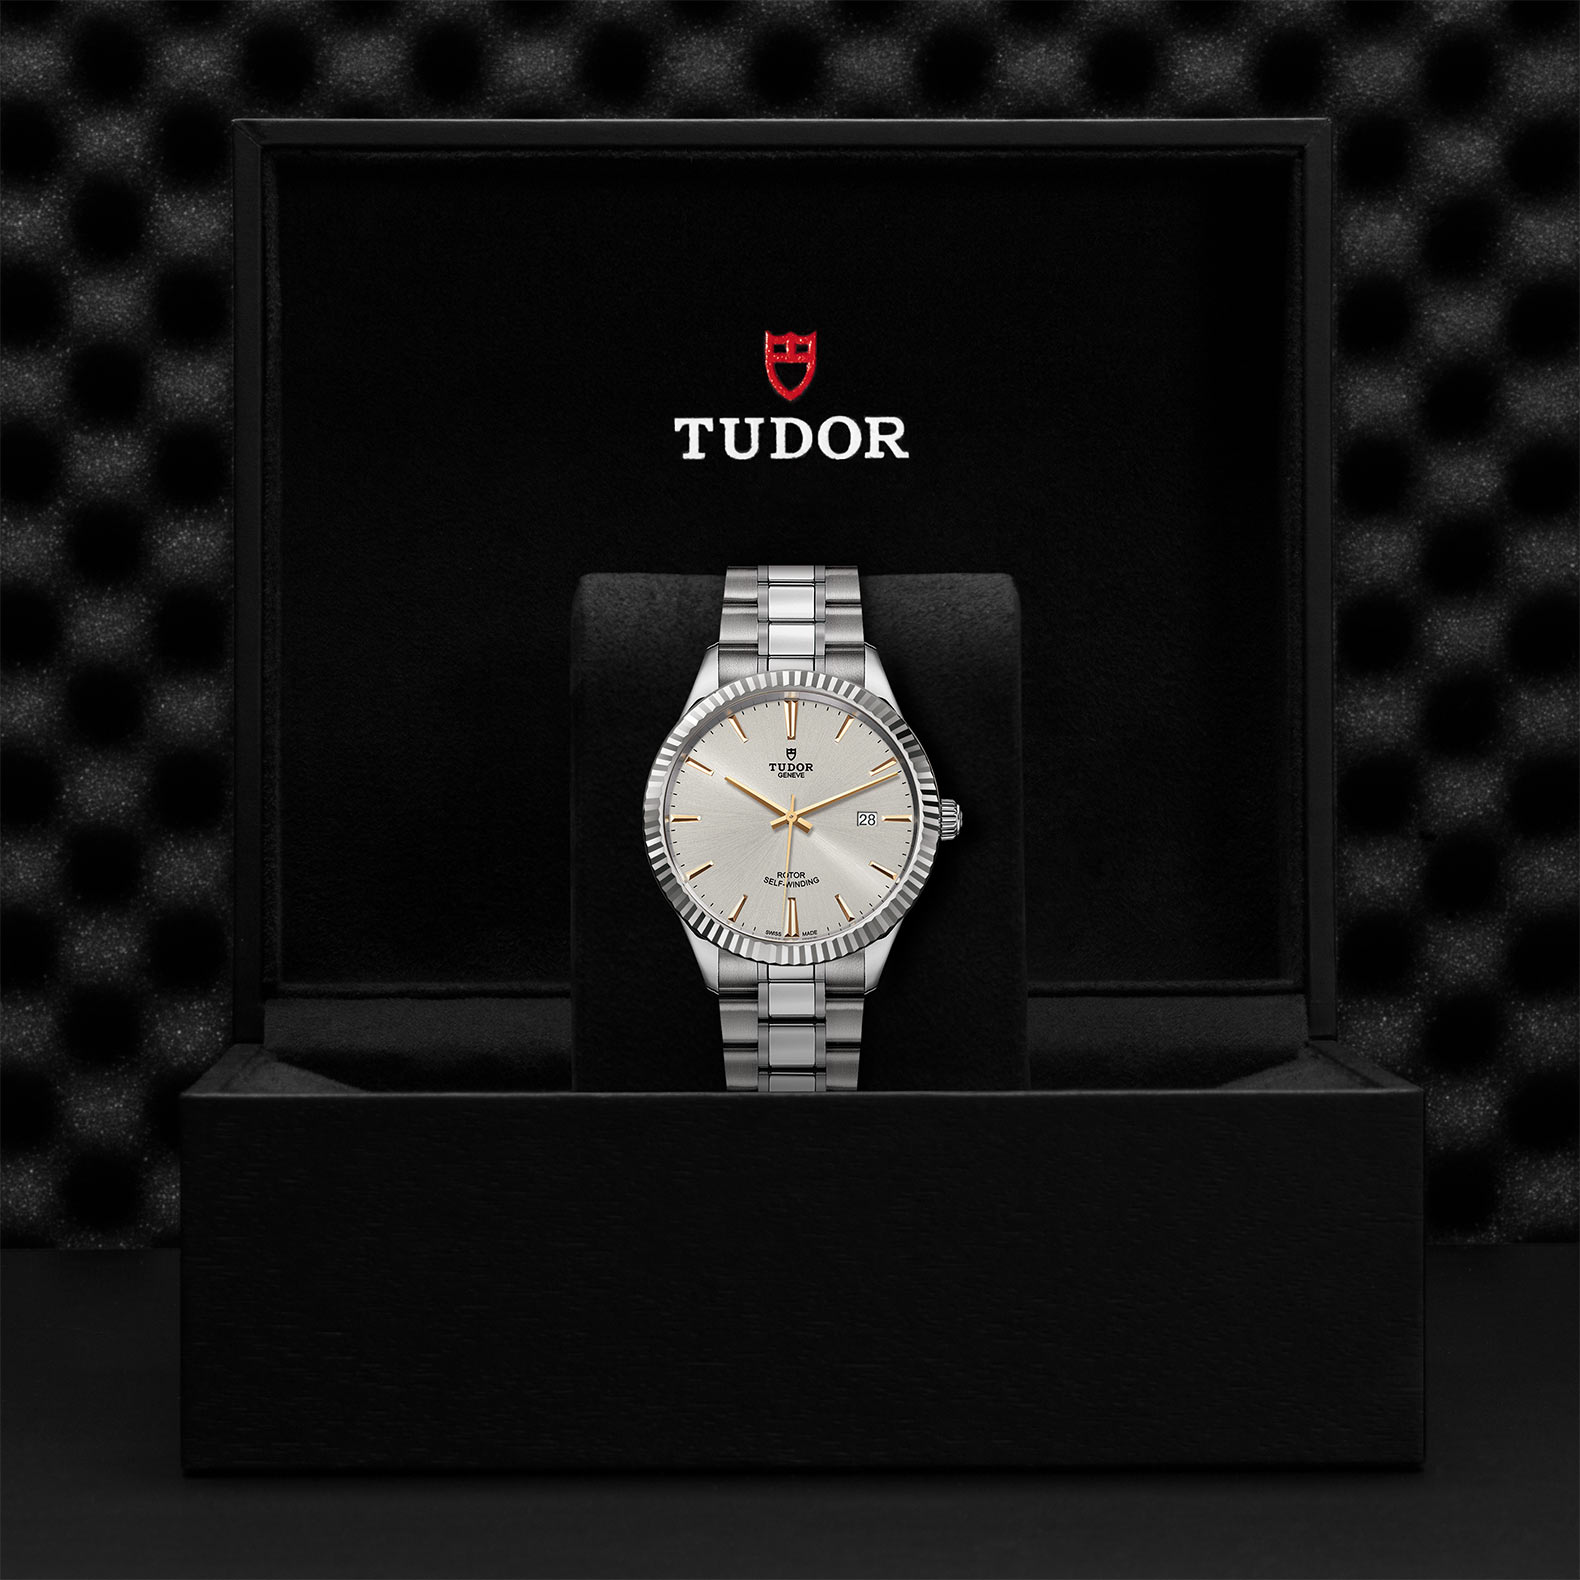 TUDOR Style M12710 0005 Presentationbox